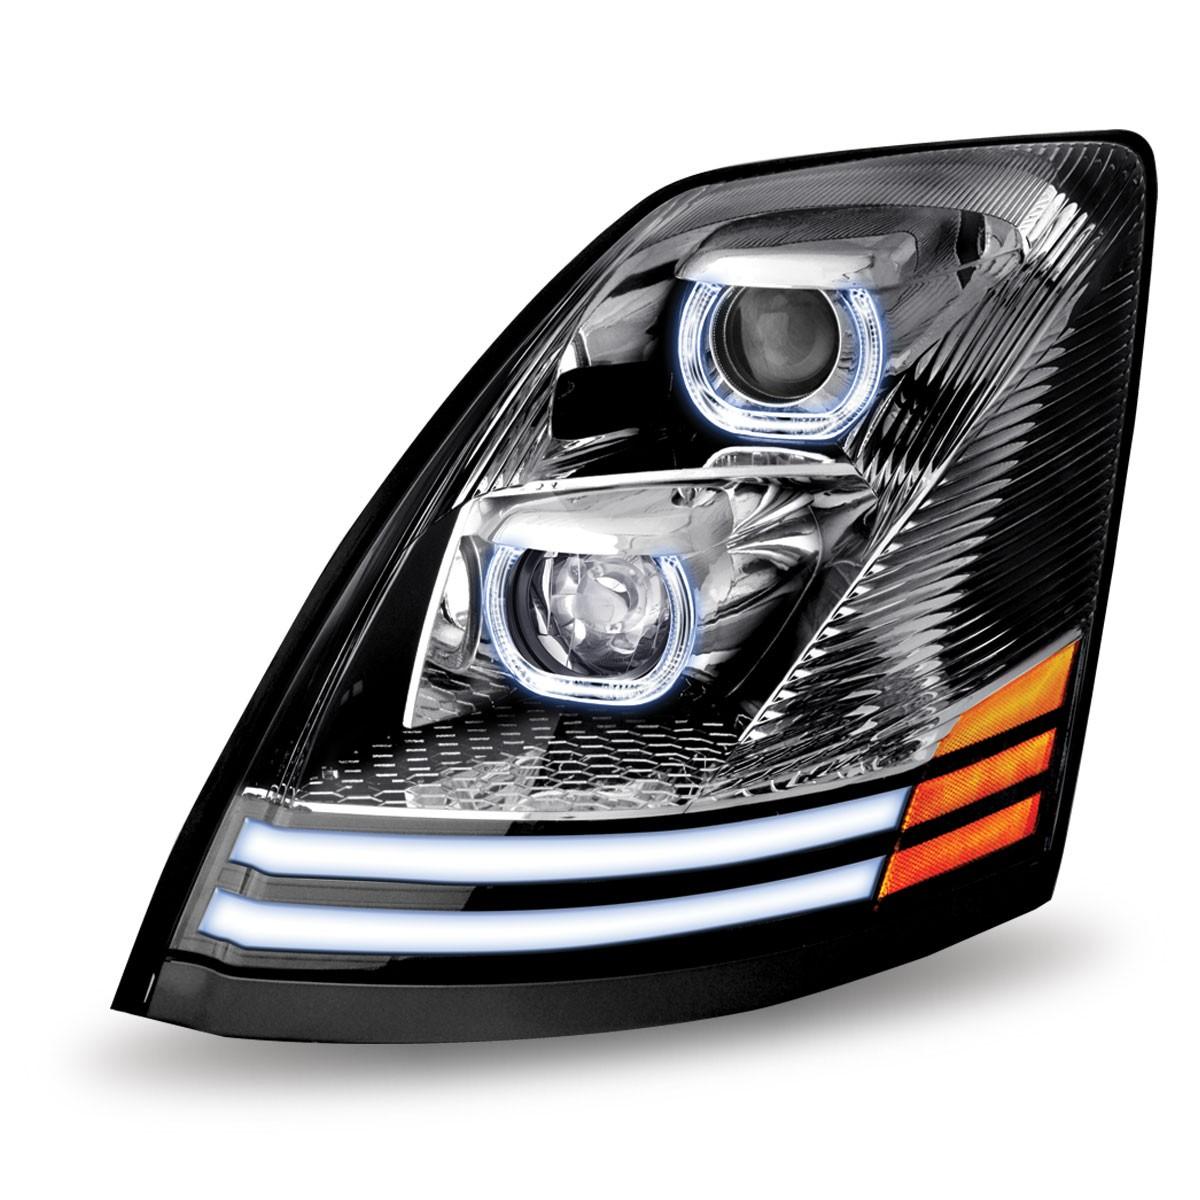 hight resolution of gm headlight wiring harness volvo rims volvo fuel pump relay volvo headlights not